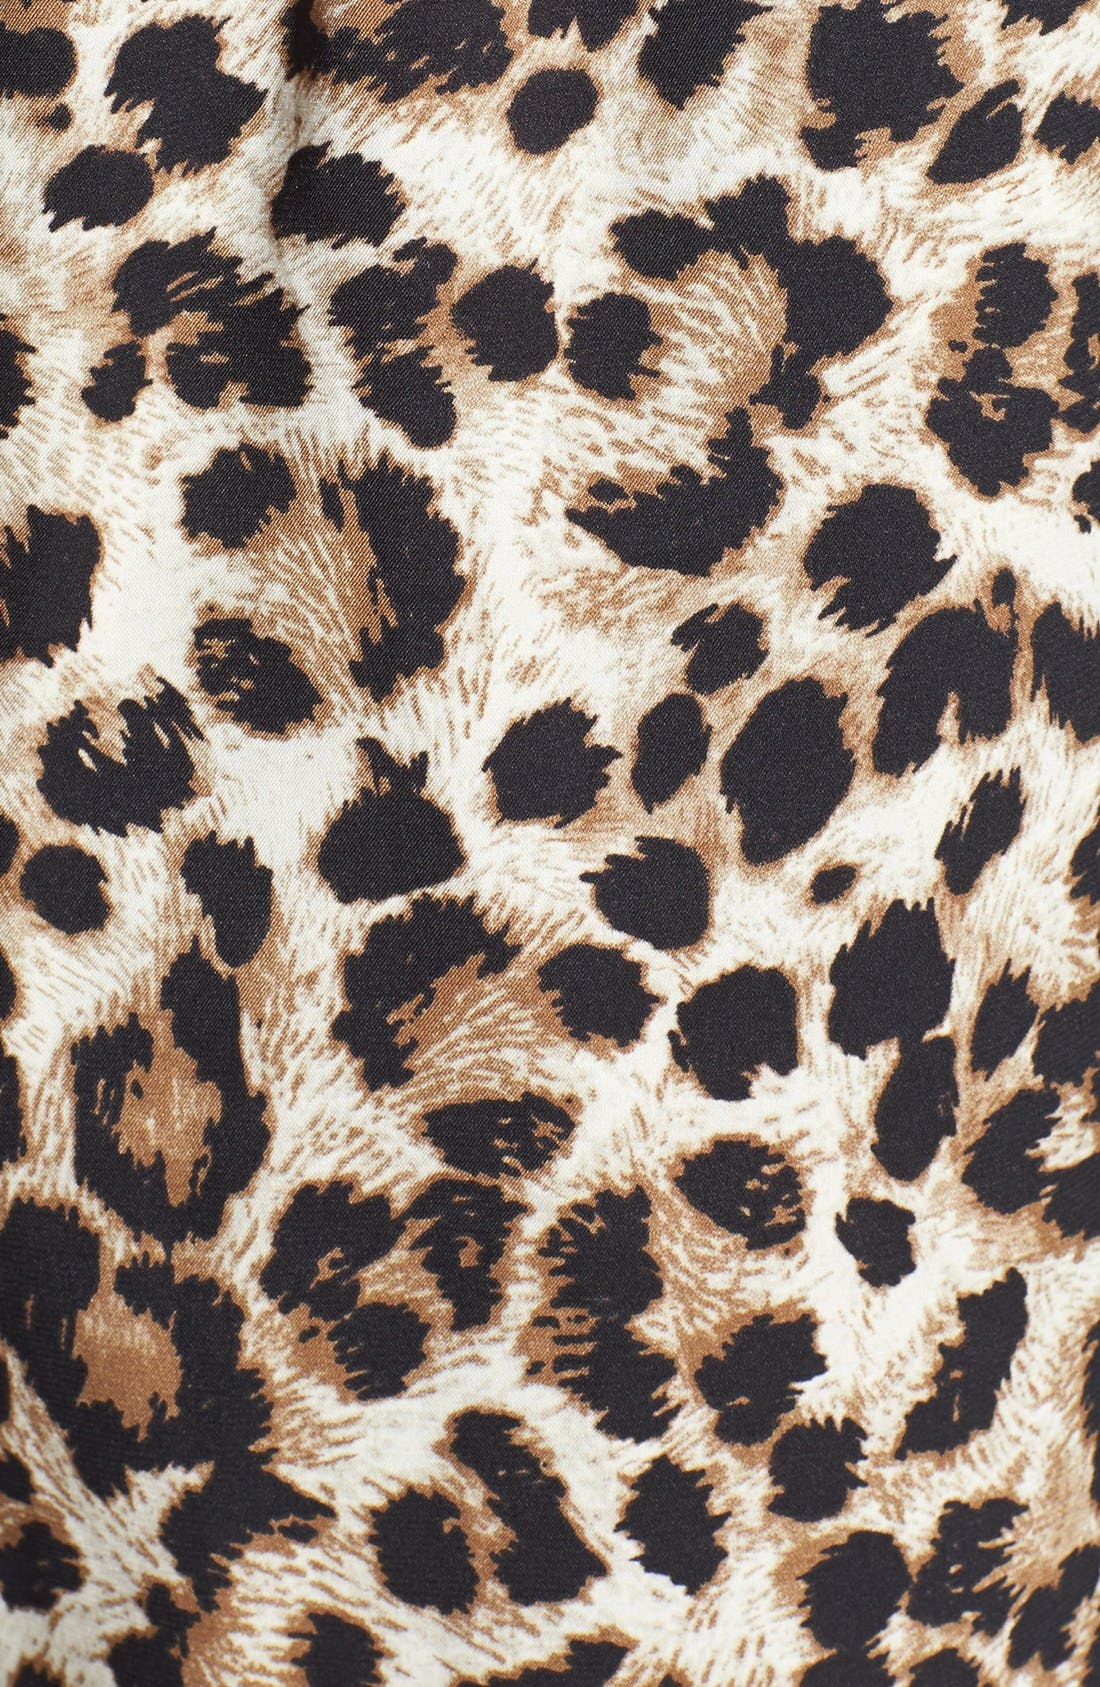 Leopard Print Drawstring Pants,                             Alternate thumbnail 3, color,                             001